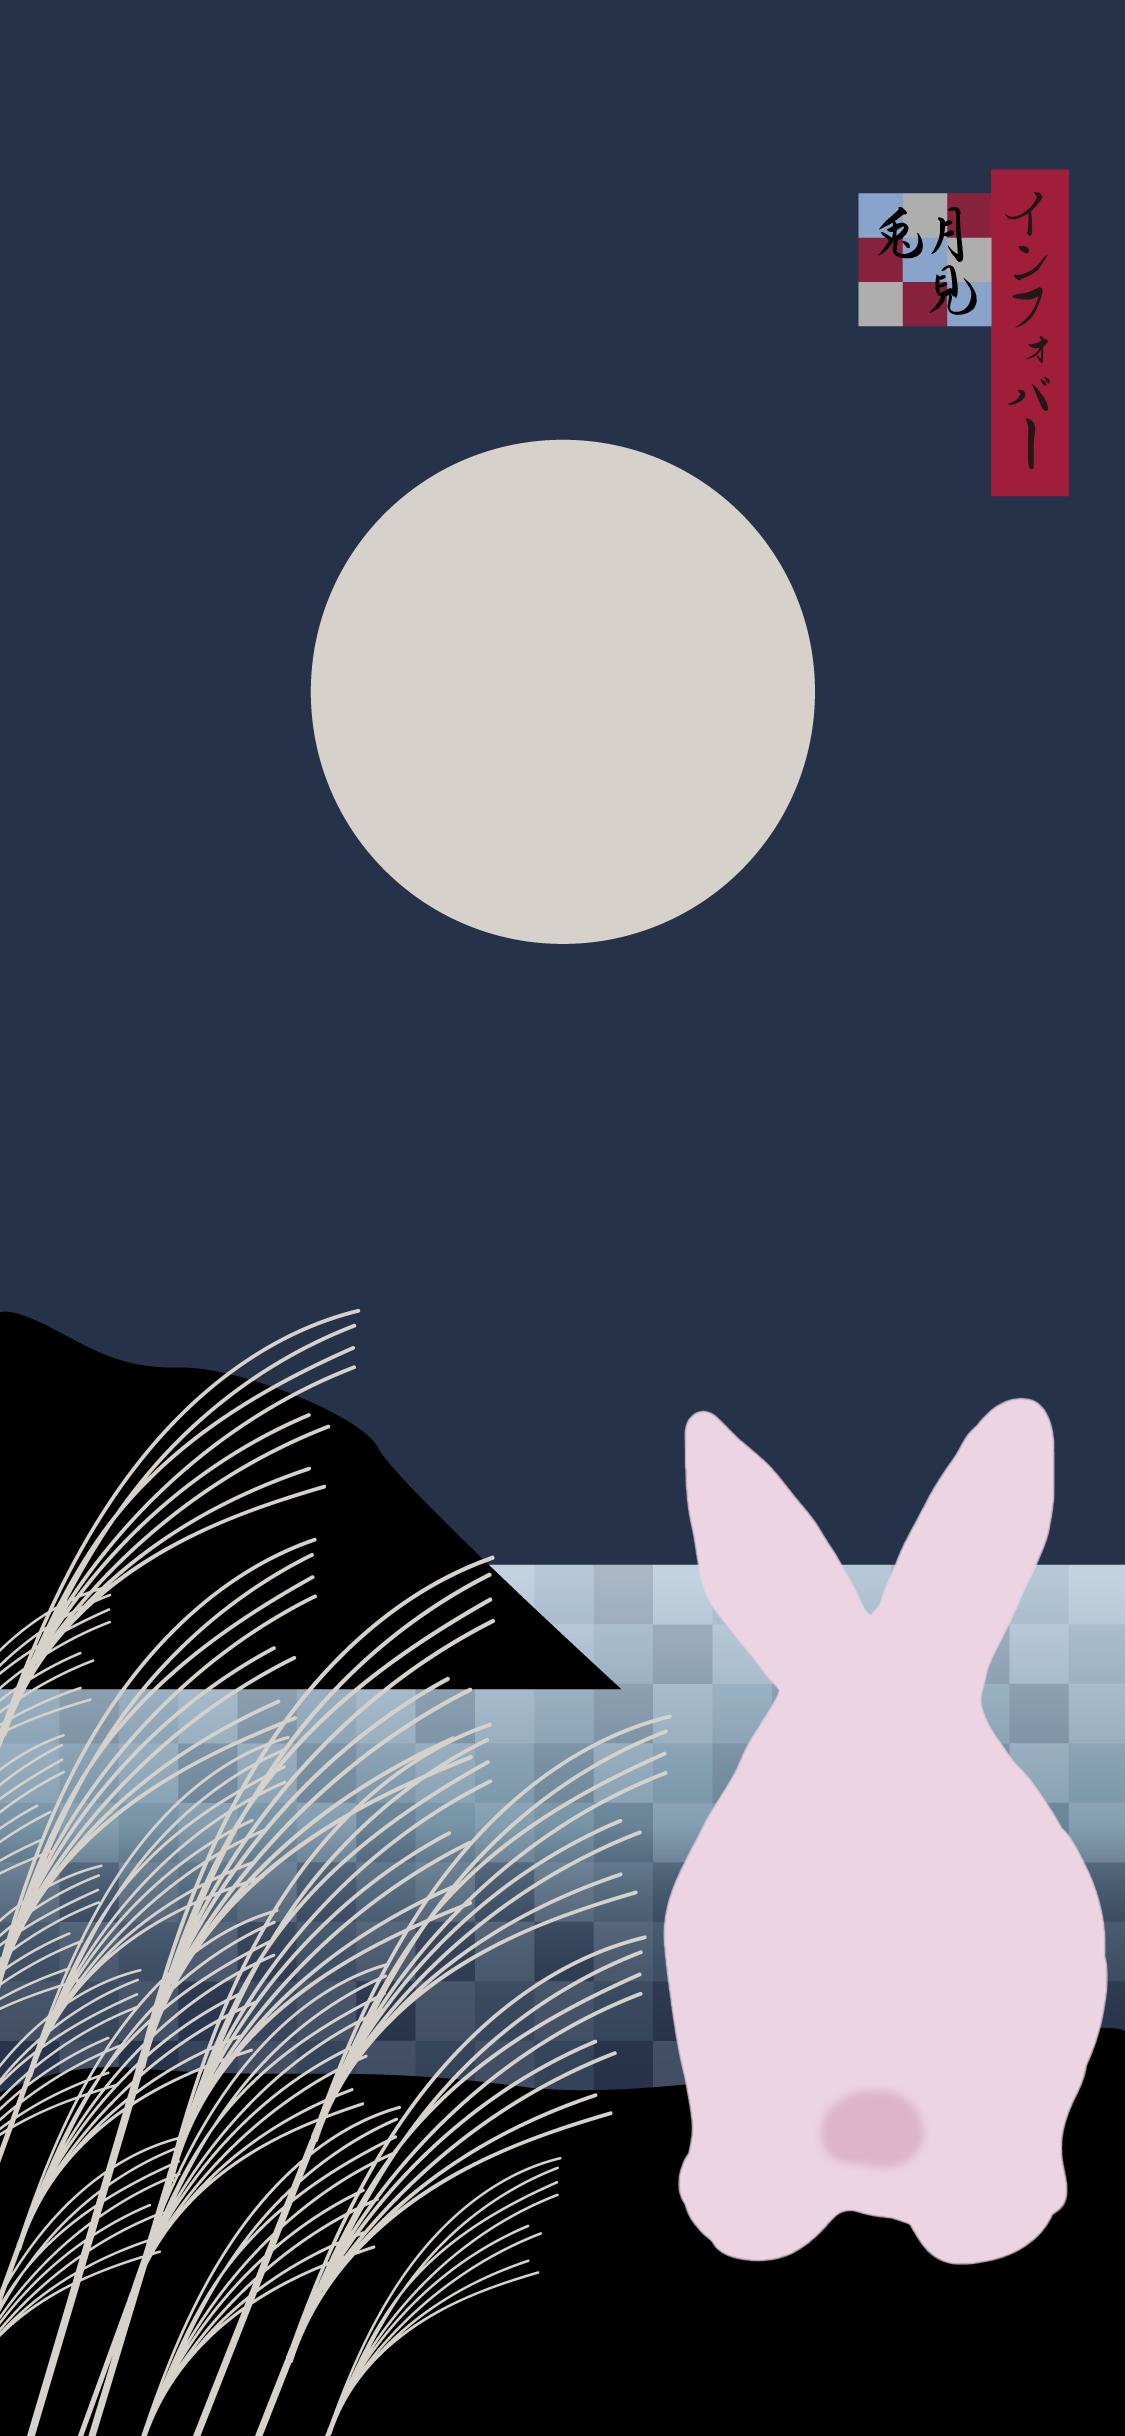 iPhone X, Xs, XR用壁紙 | 月見うさぎ(1125x2436)